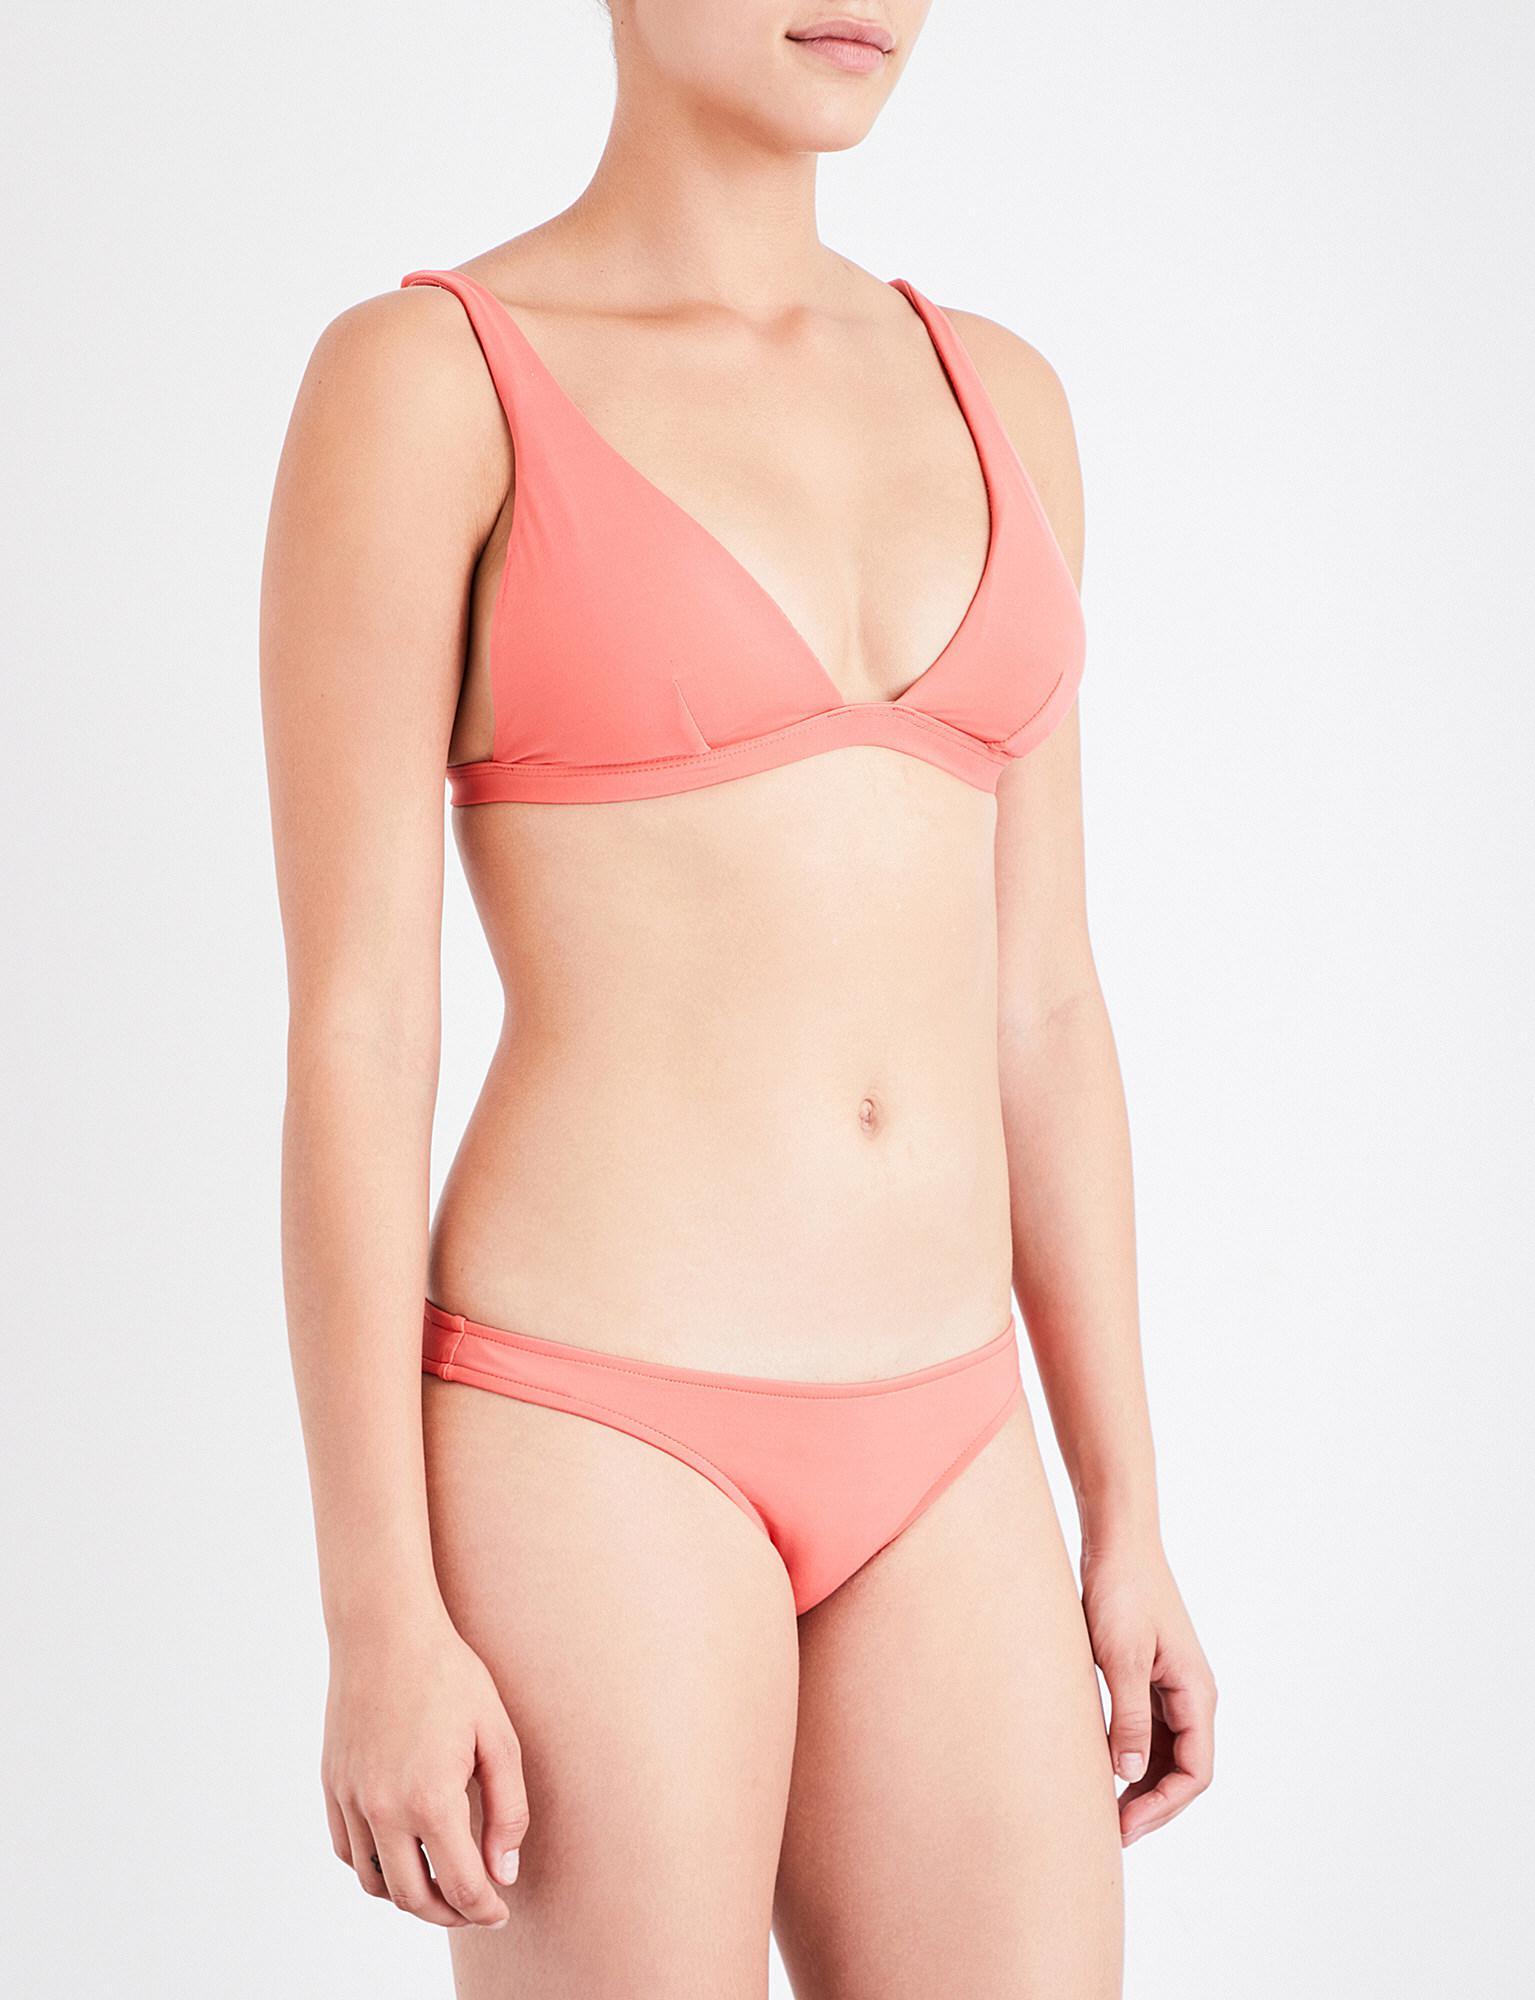 bf1a2bc1f62fc Jets by Jessika Allen Jetset Triangle Bikini Top in Pink - Lyst